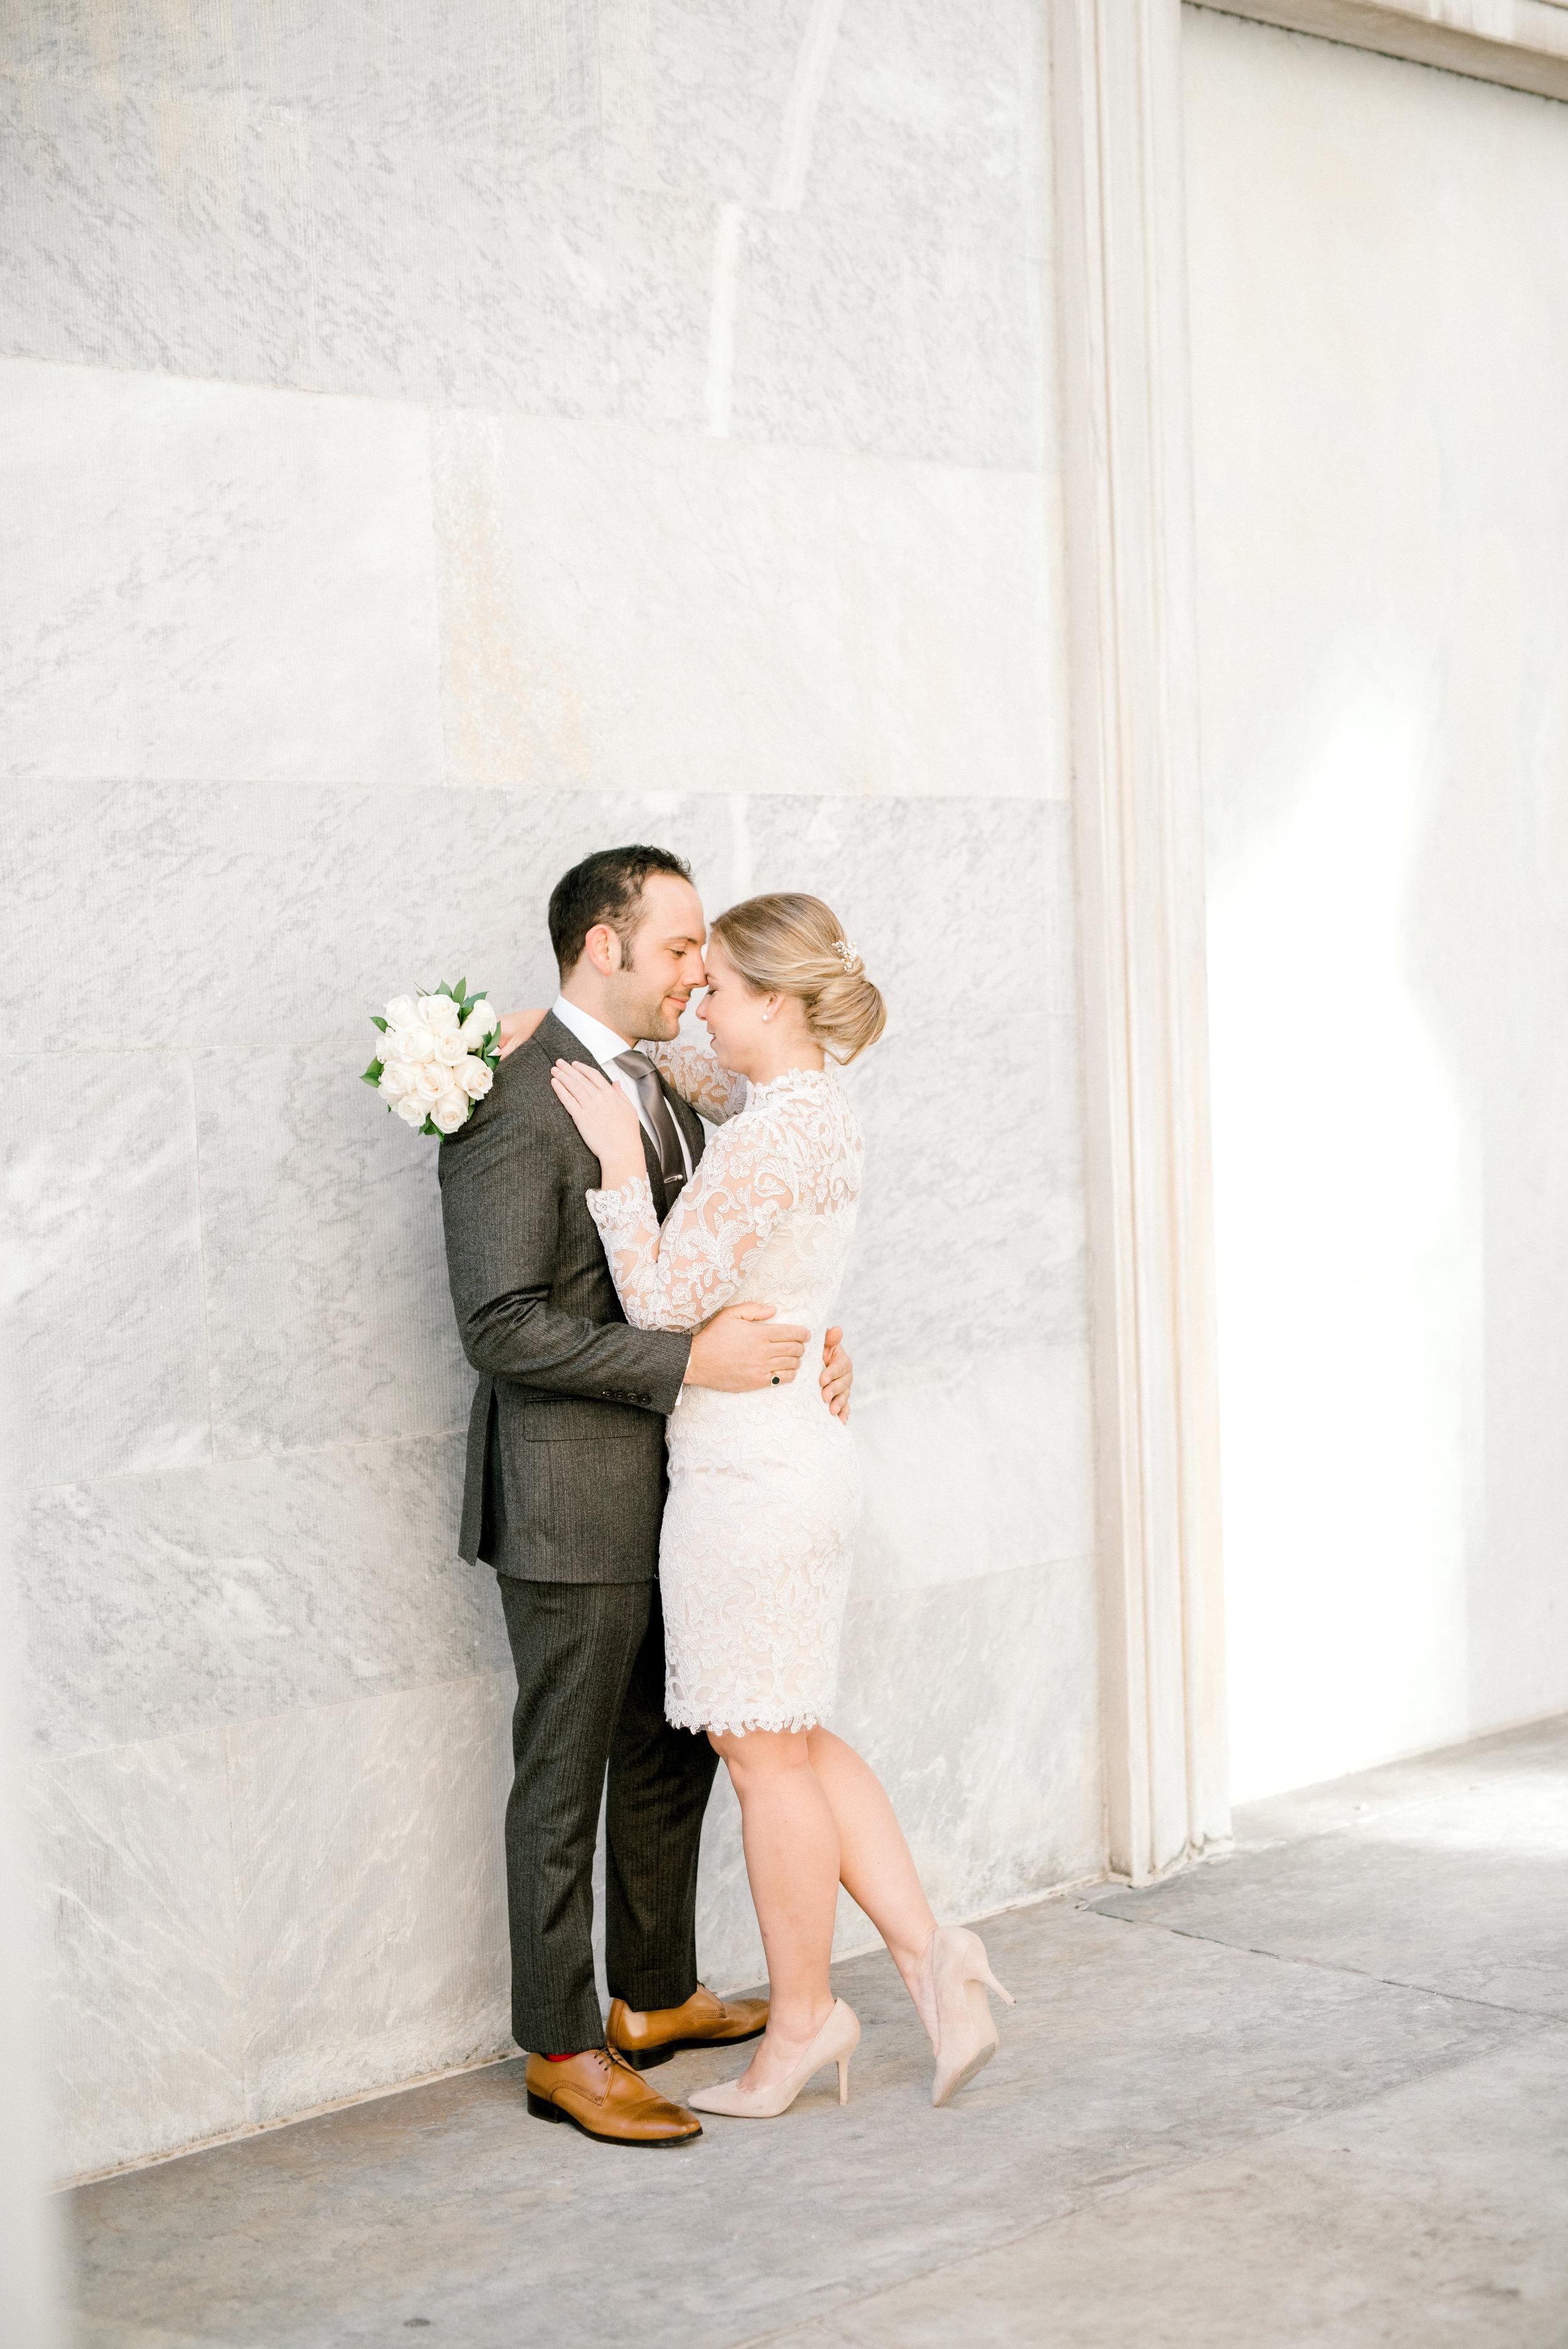 haley-richter-photography-philadelphia-city-hall-elopement-022.jpg